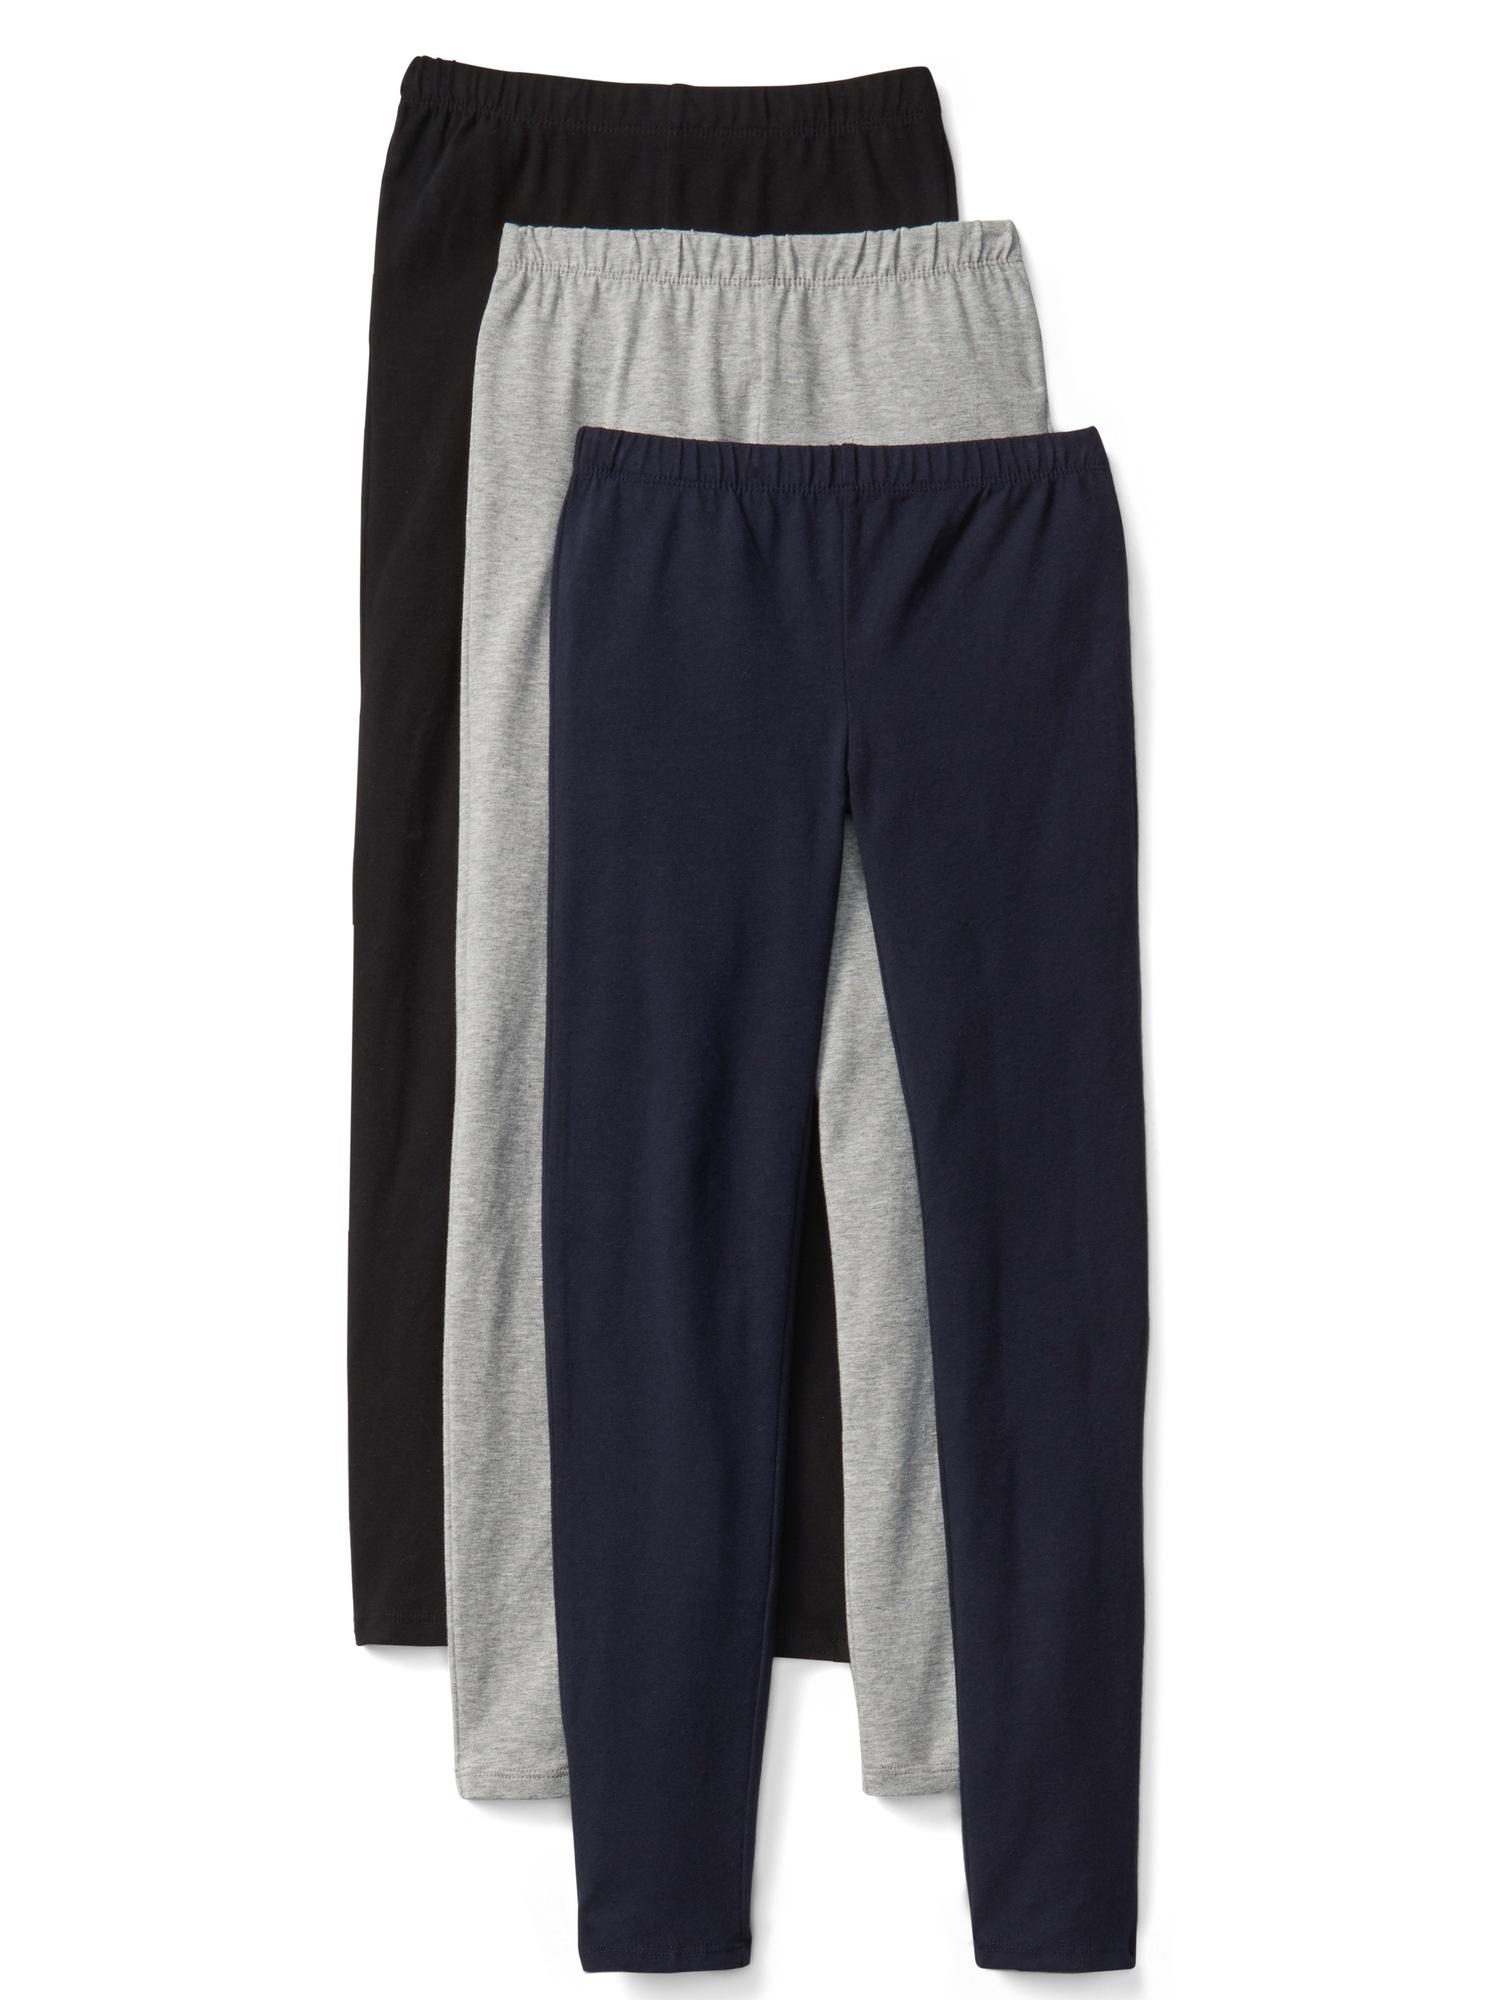 Baby Toddler Girl Kids Gap Capri Leggings Pants 2 items package 18-24M Size